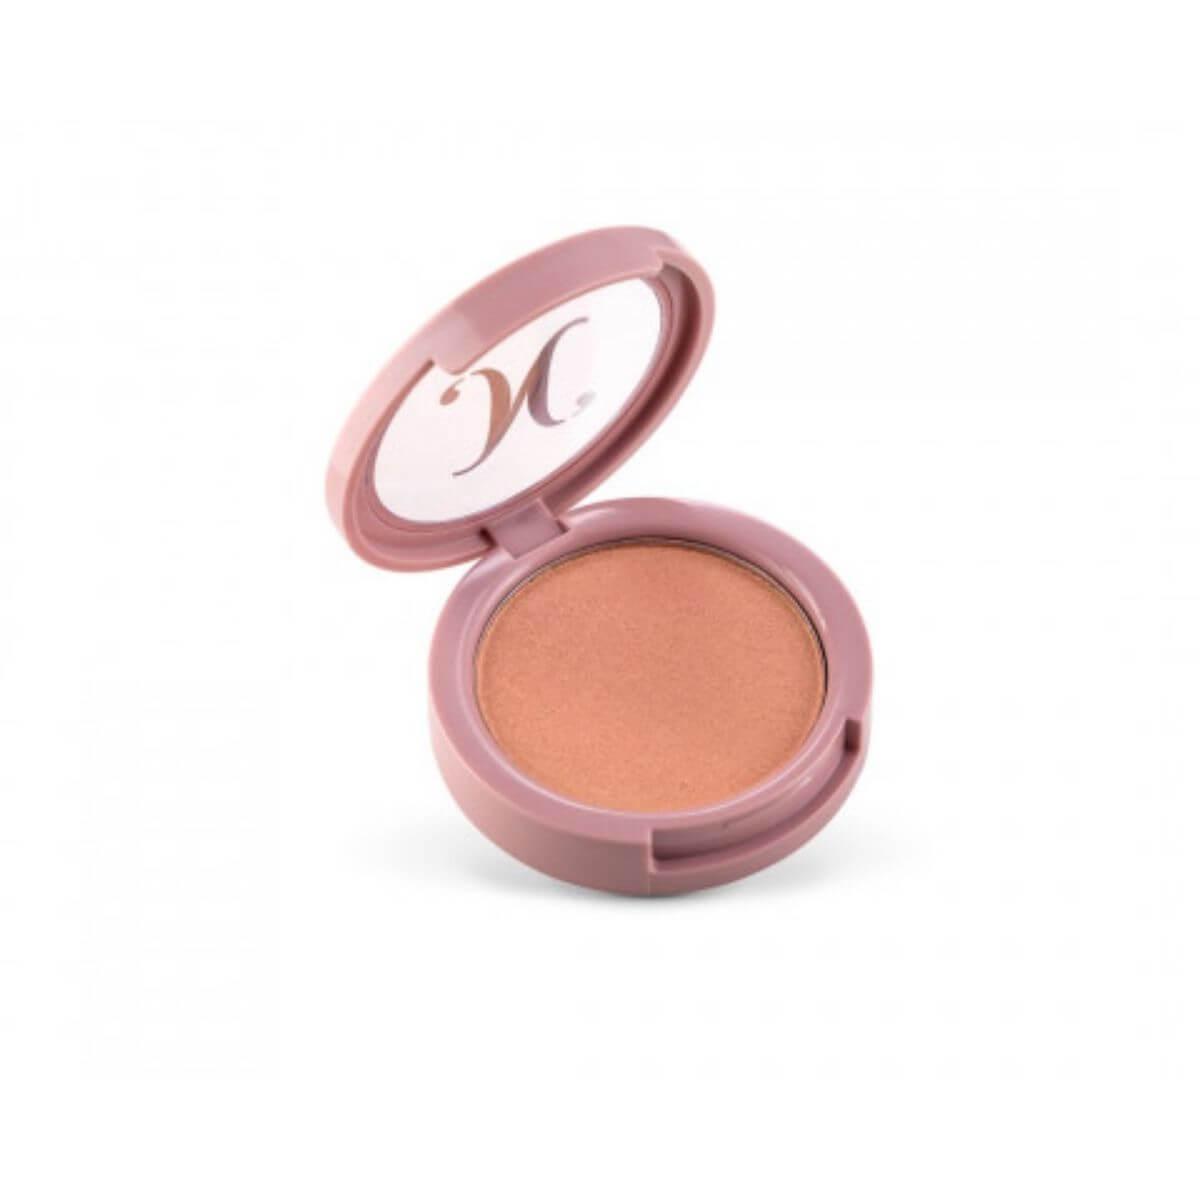 Blush Compacto Cintilante Radiant Peach - Nathalia Capelo